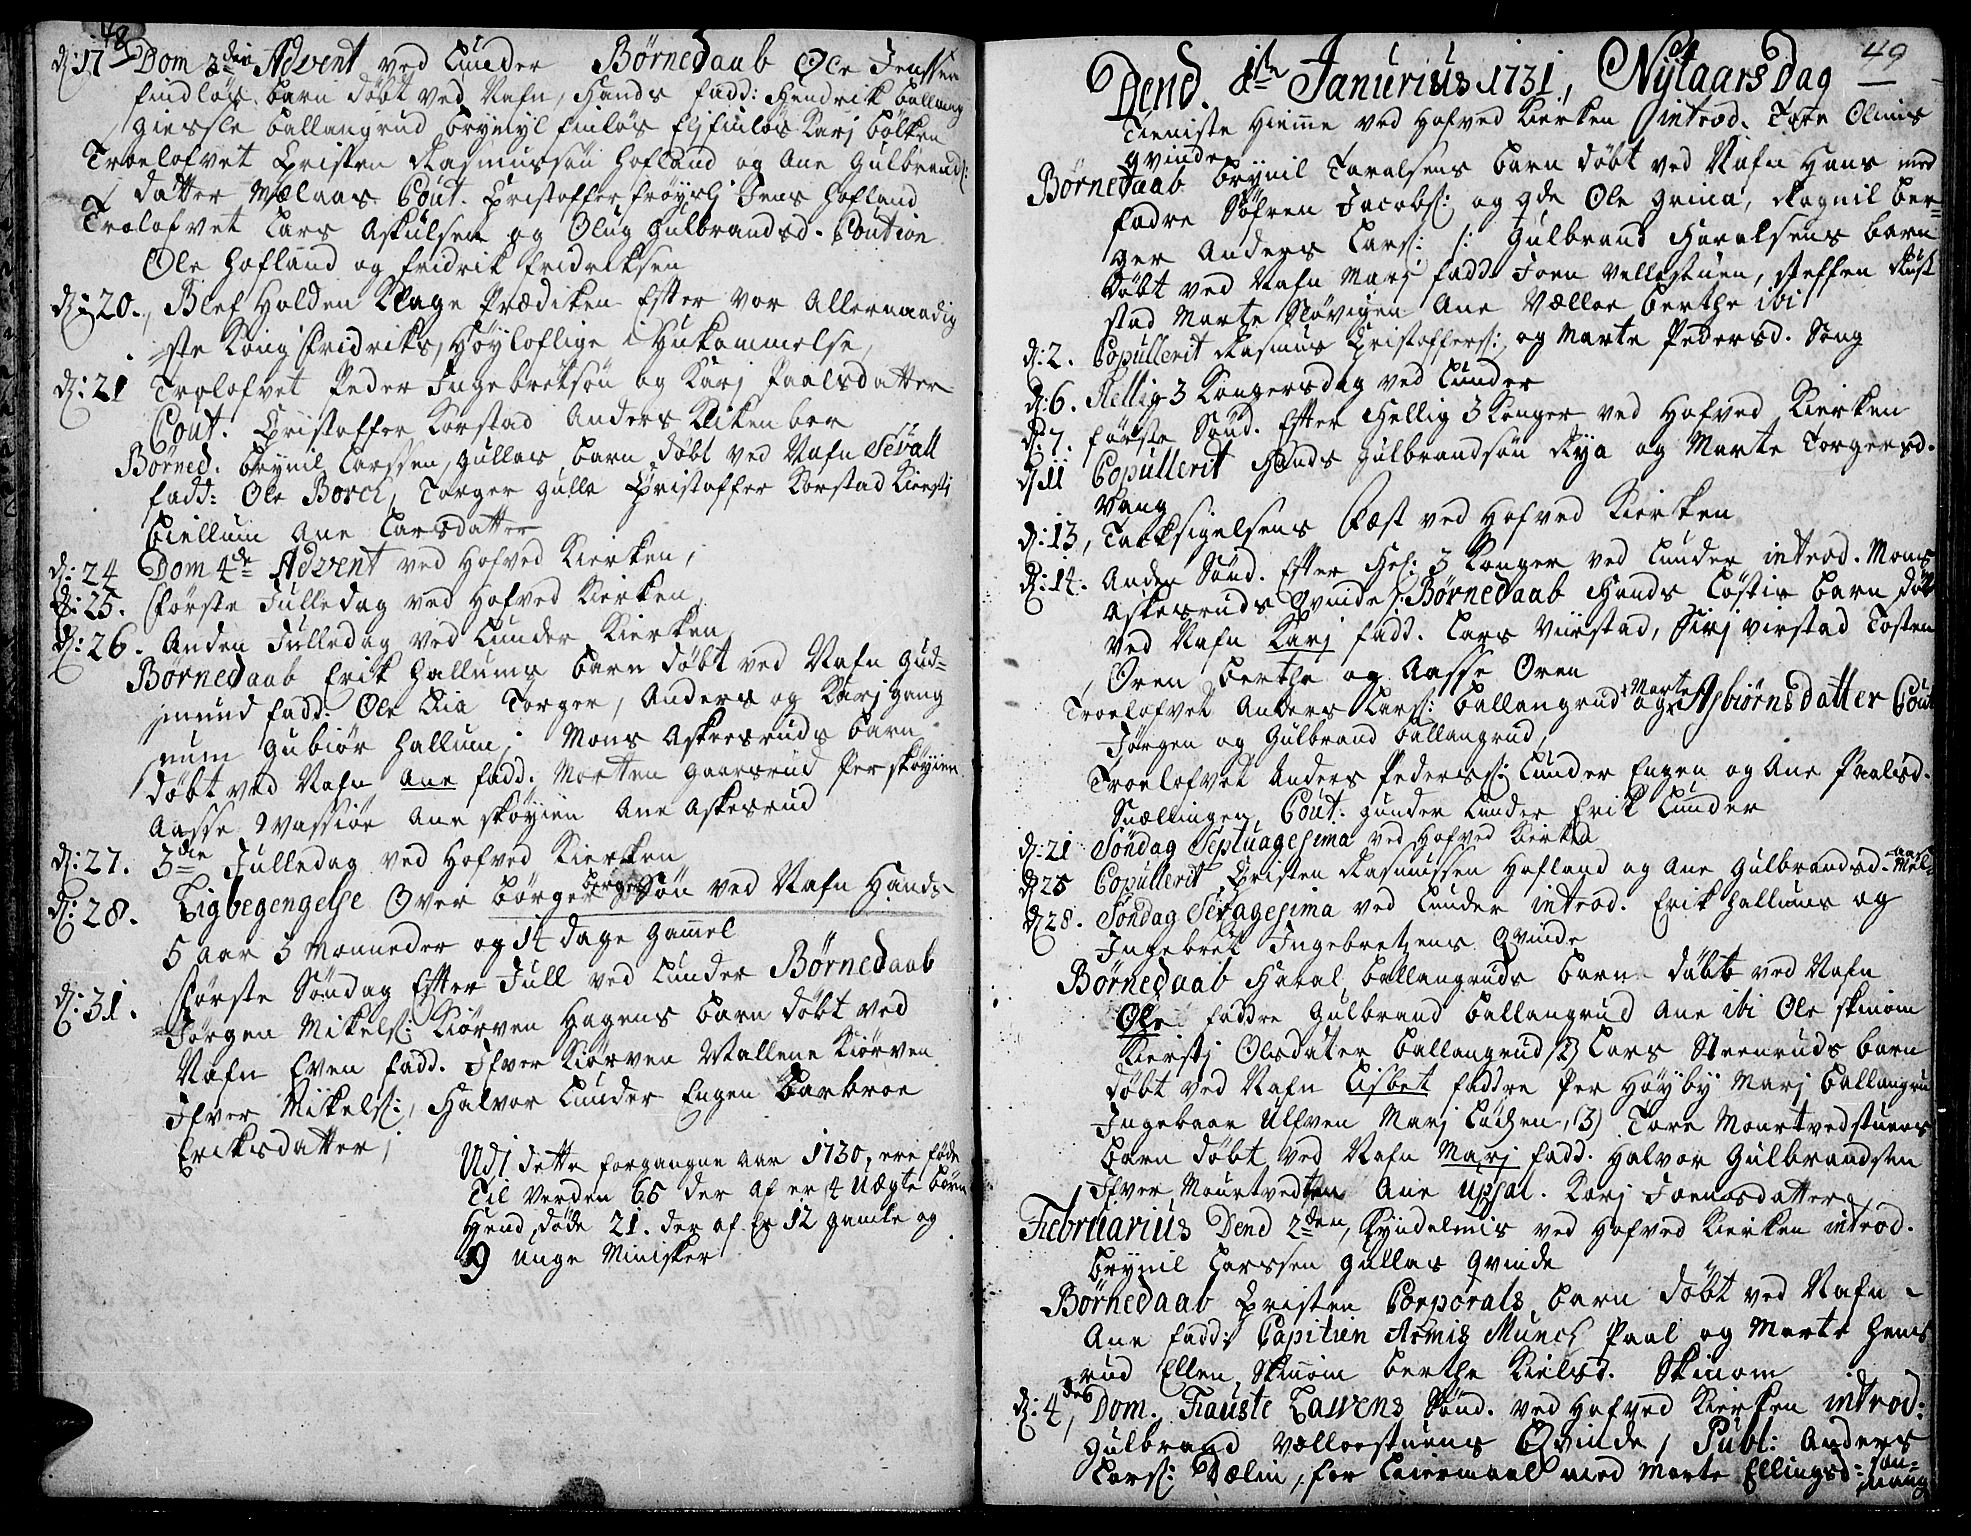 SAH, Jevnaker prestekontor, Ministerialbok nr. 2, 1725-1751, s. 48-49